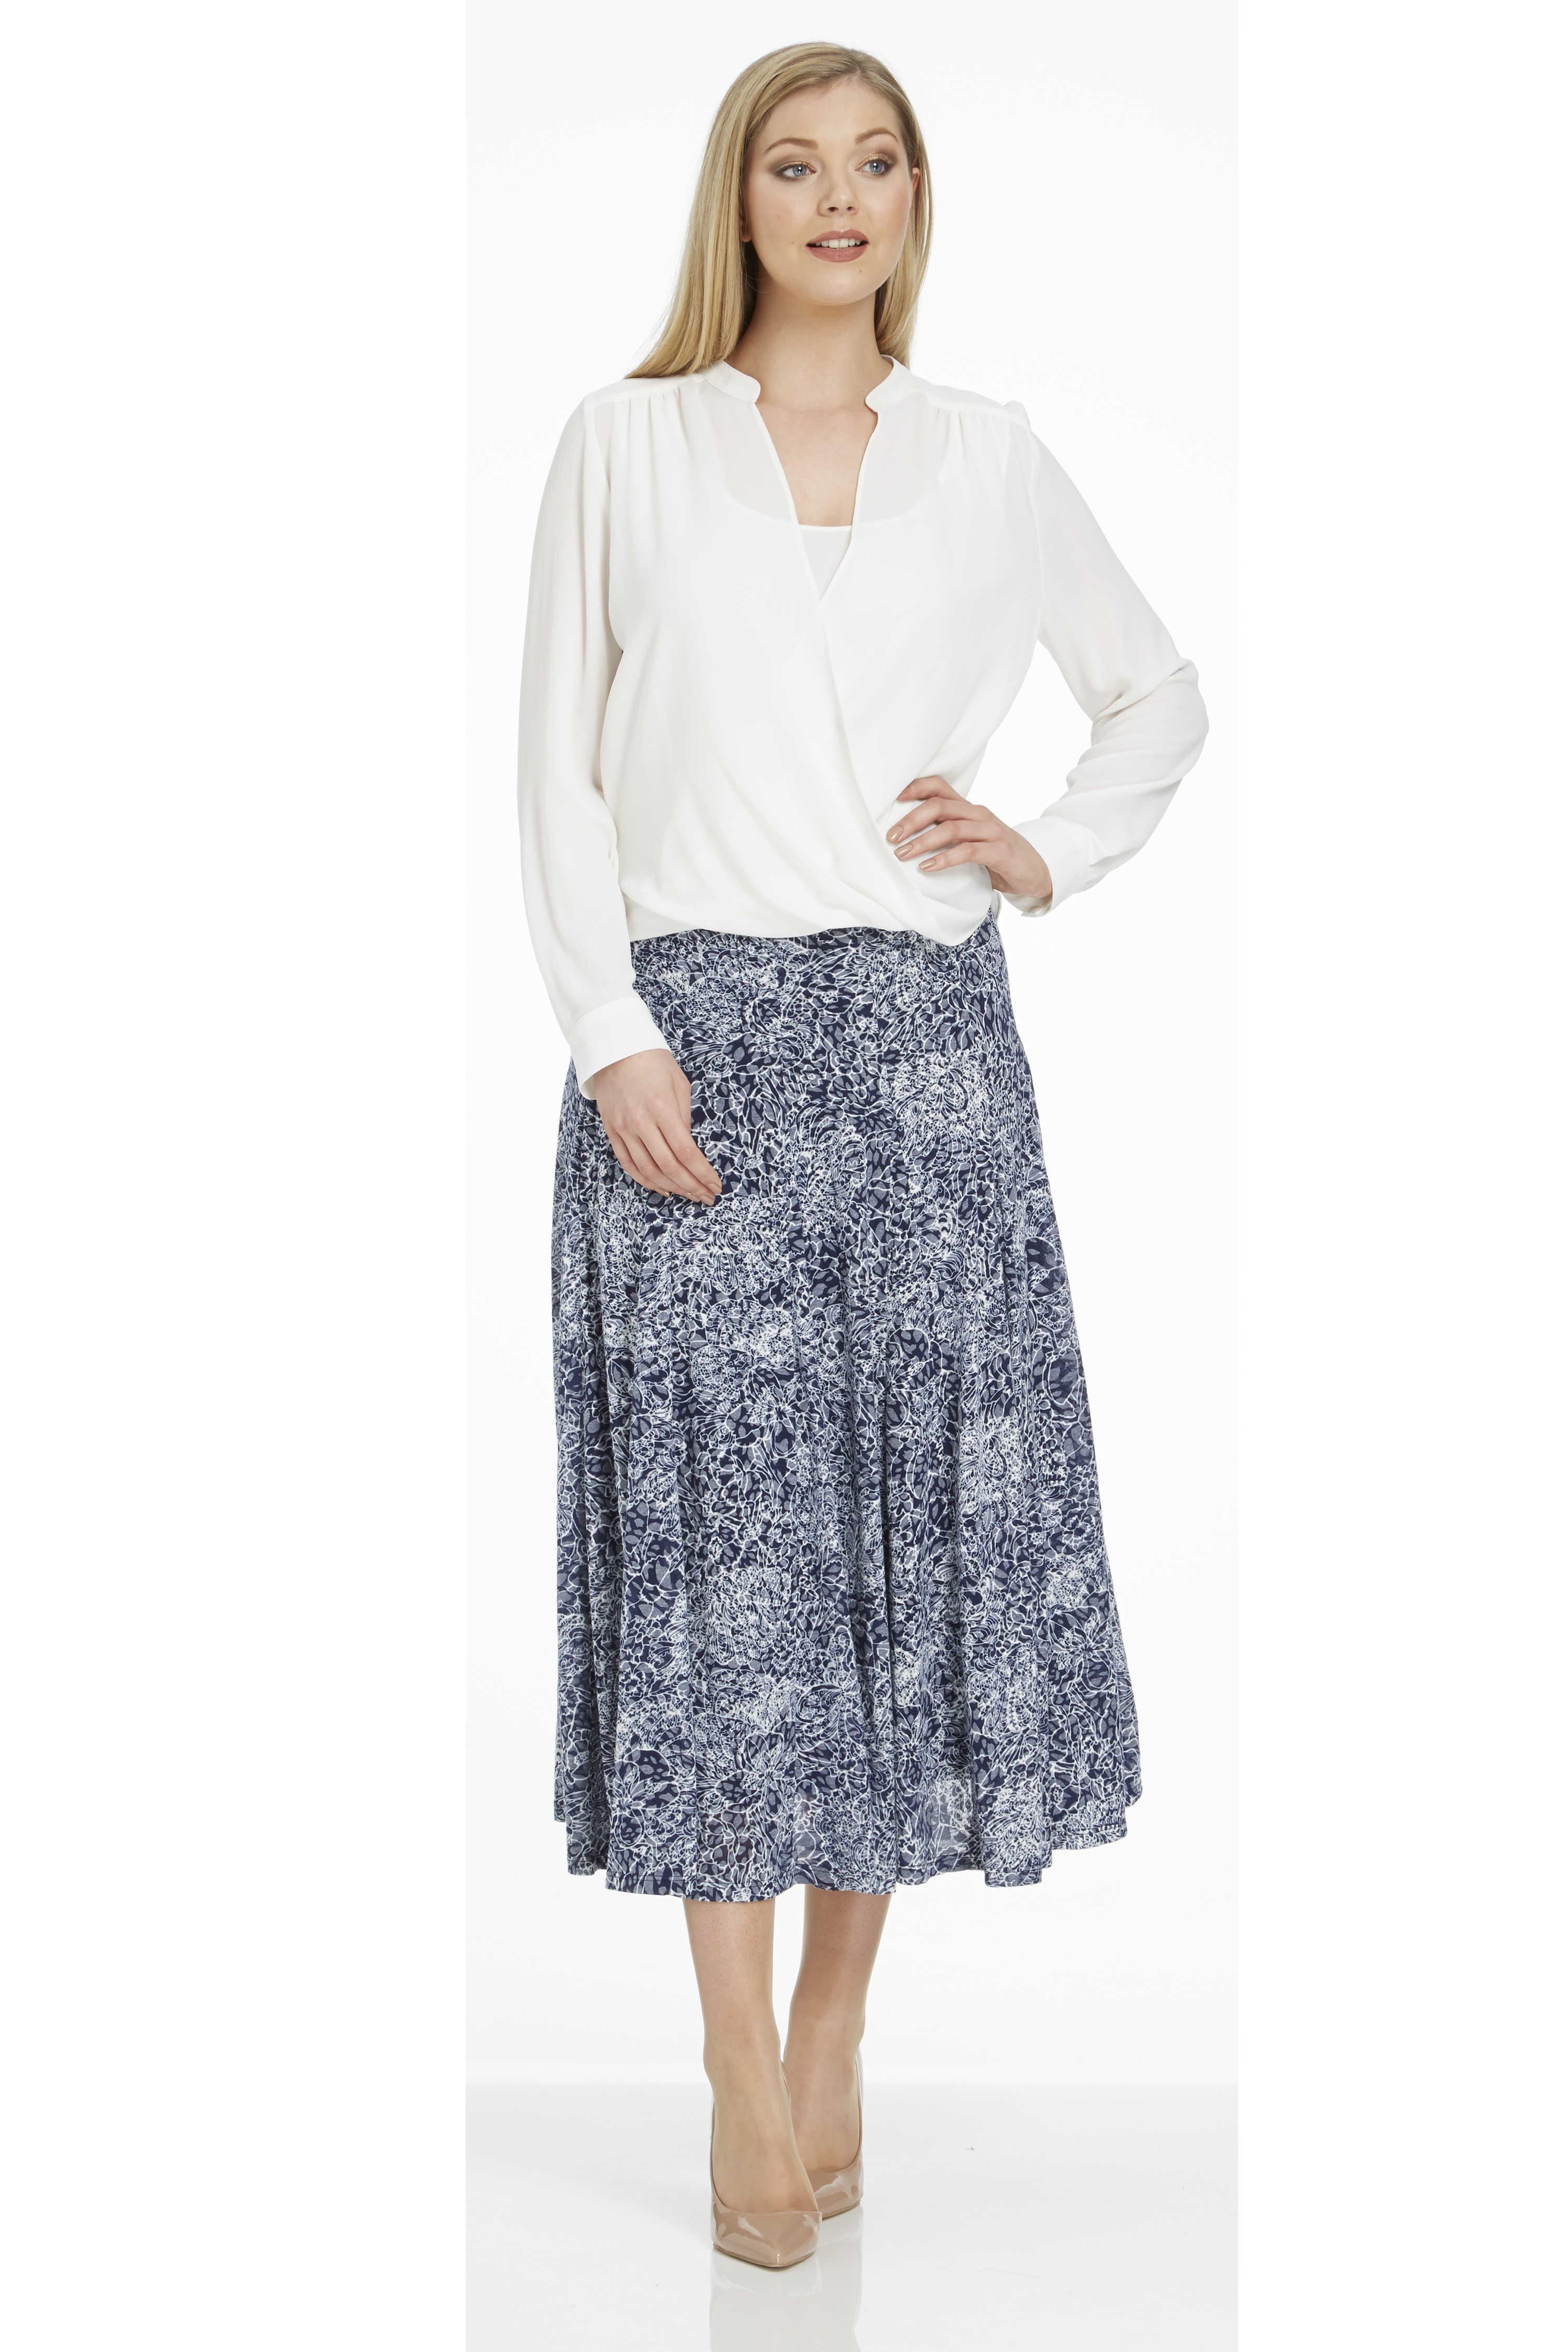 Roman-Originals-Ladies-Floral-Burnout-Skirt-Navy